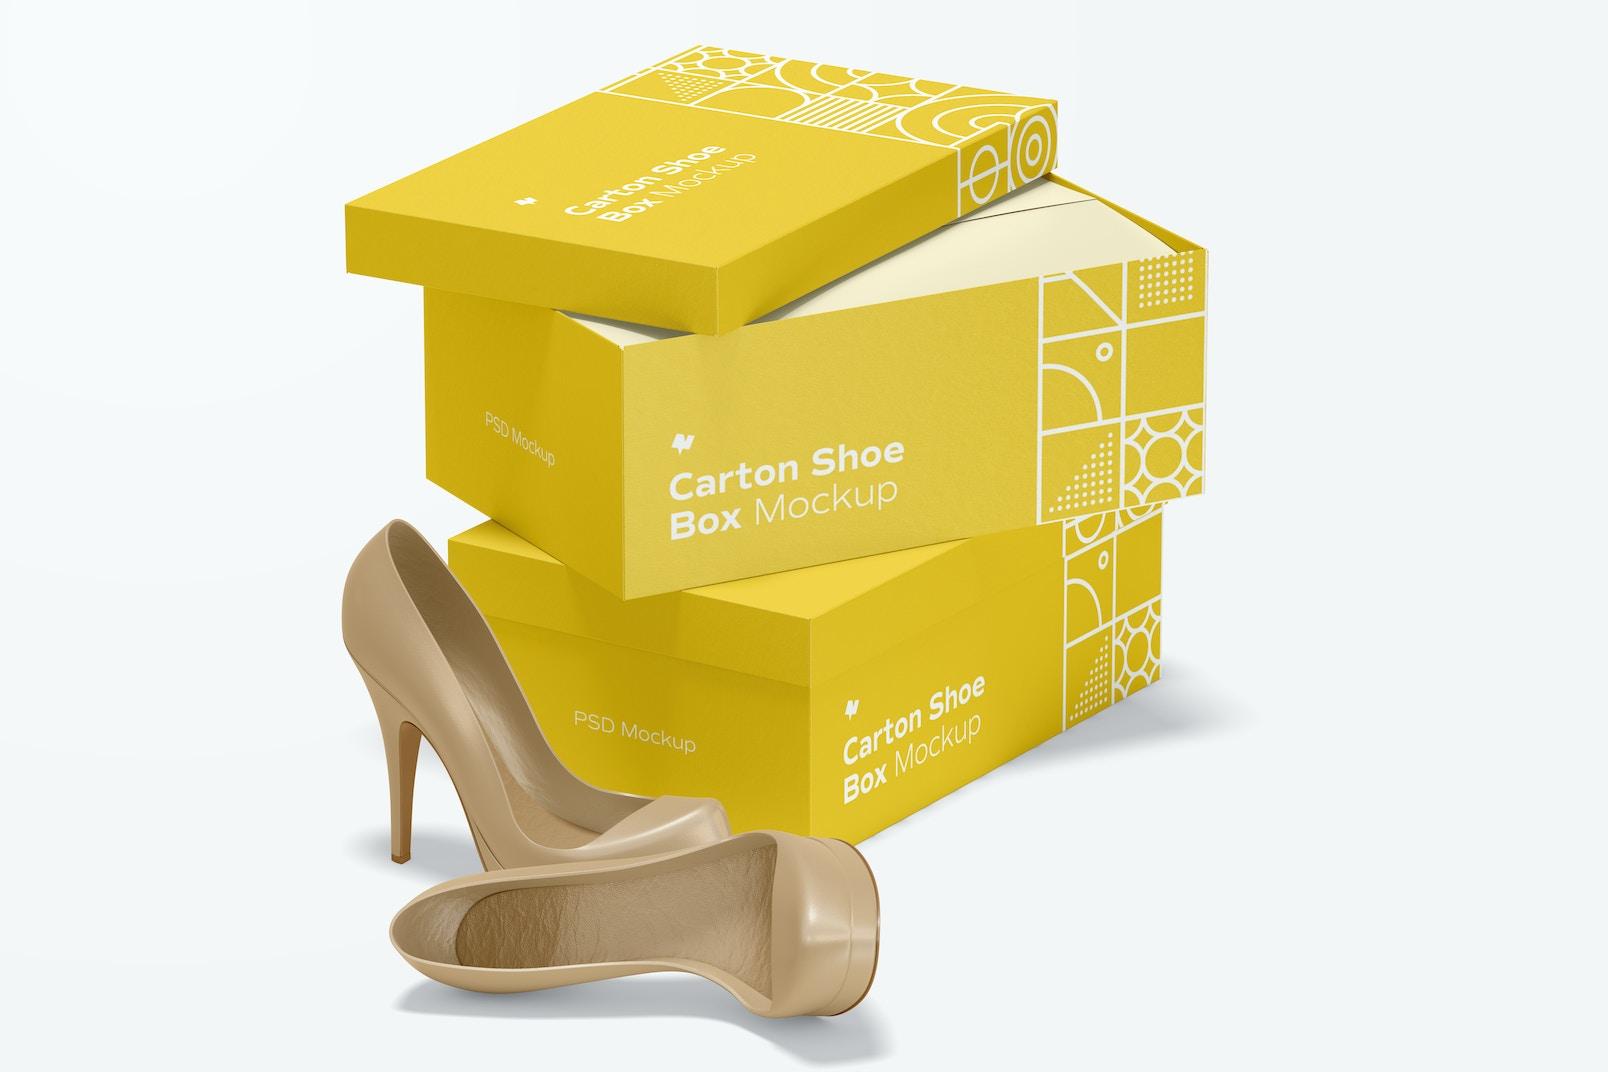 Carton Shoe Boxes Mockup, Stacked